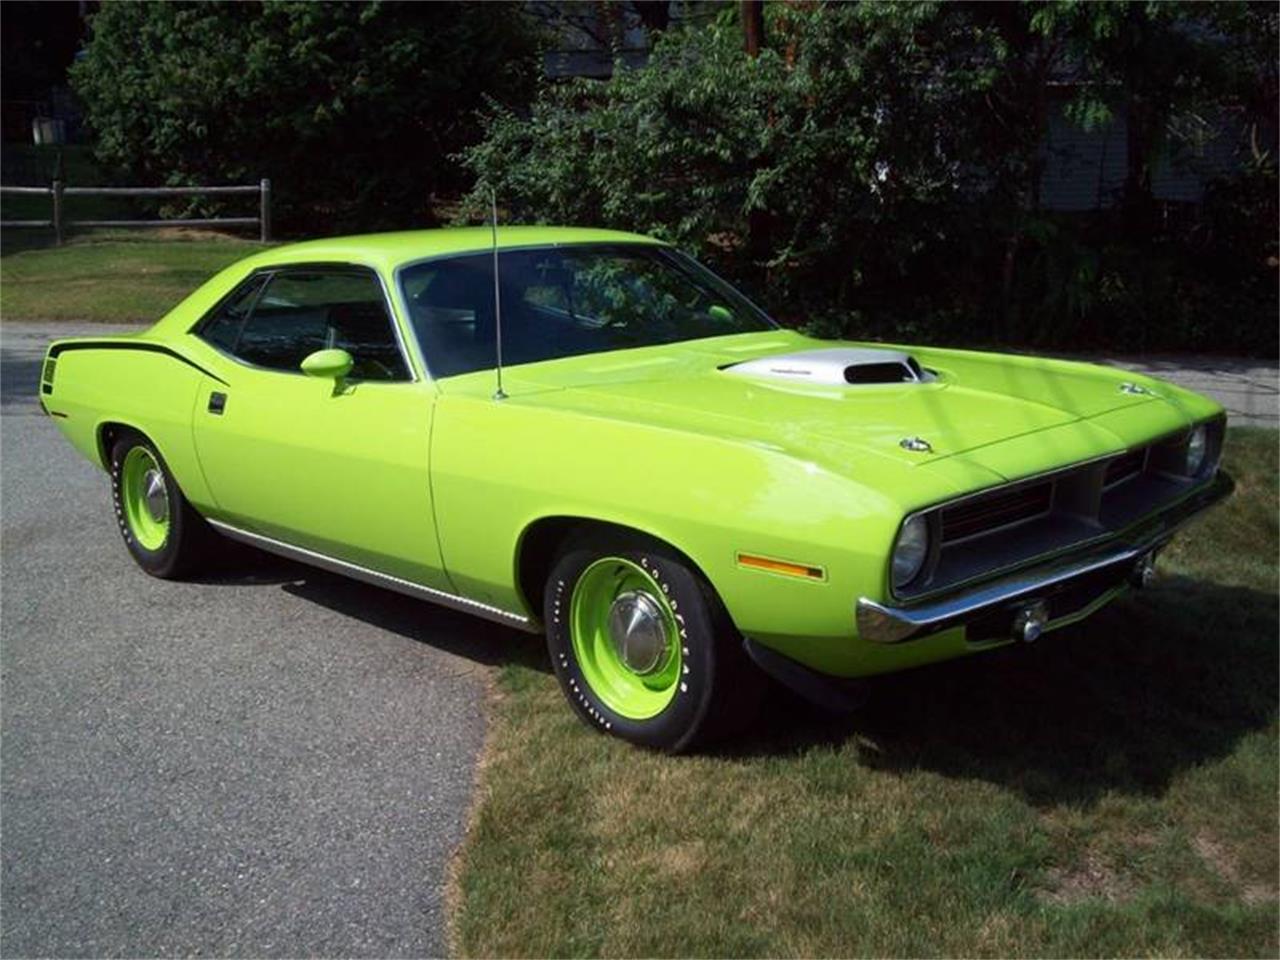 1970 Plymouth Barracuda For Sale Classiccars Com Cc 1318814